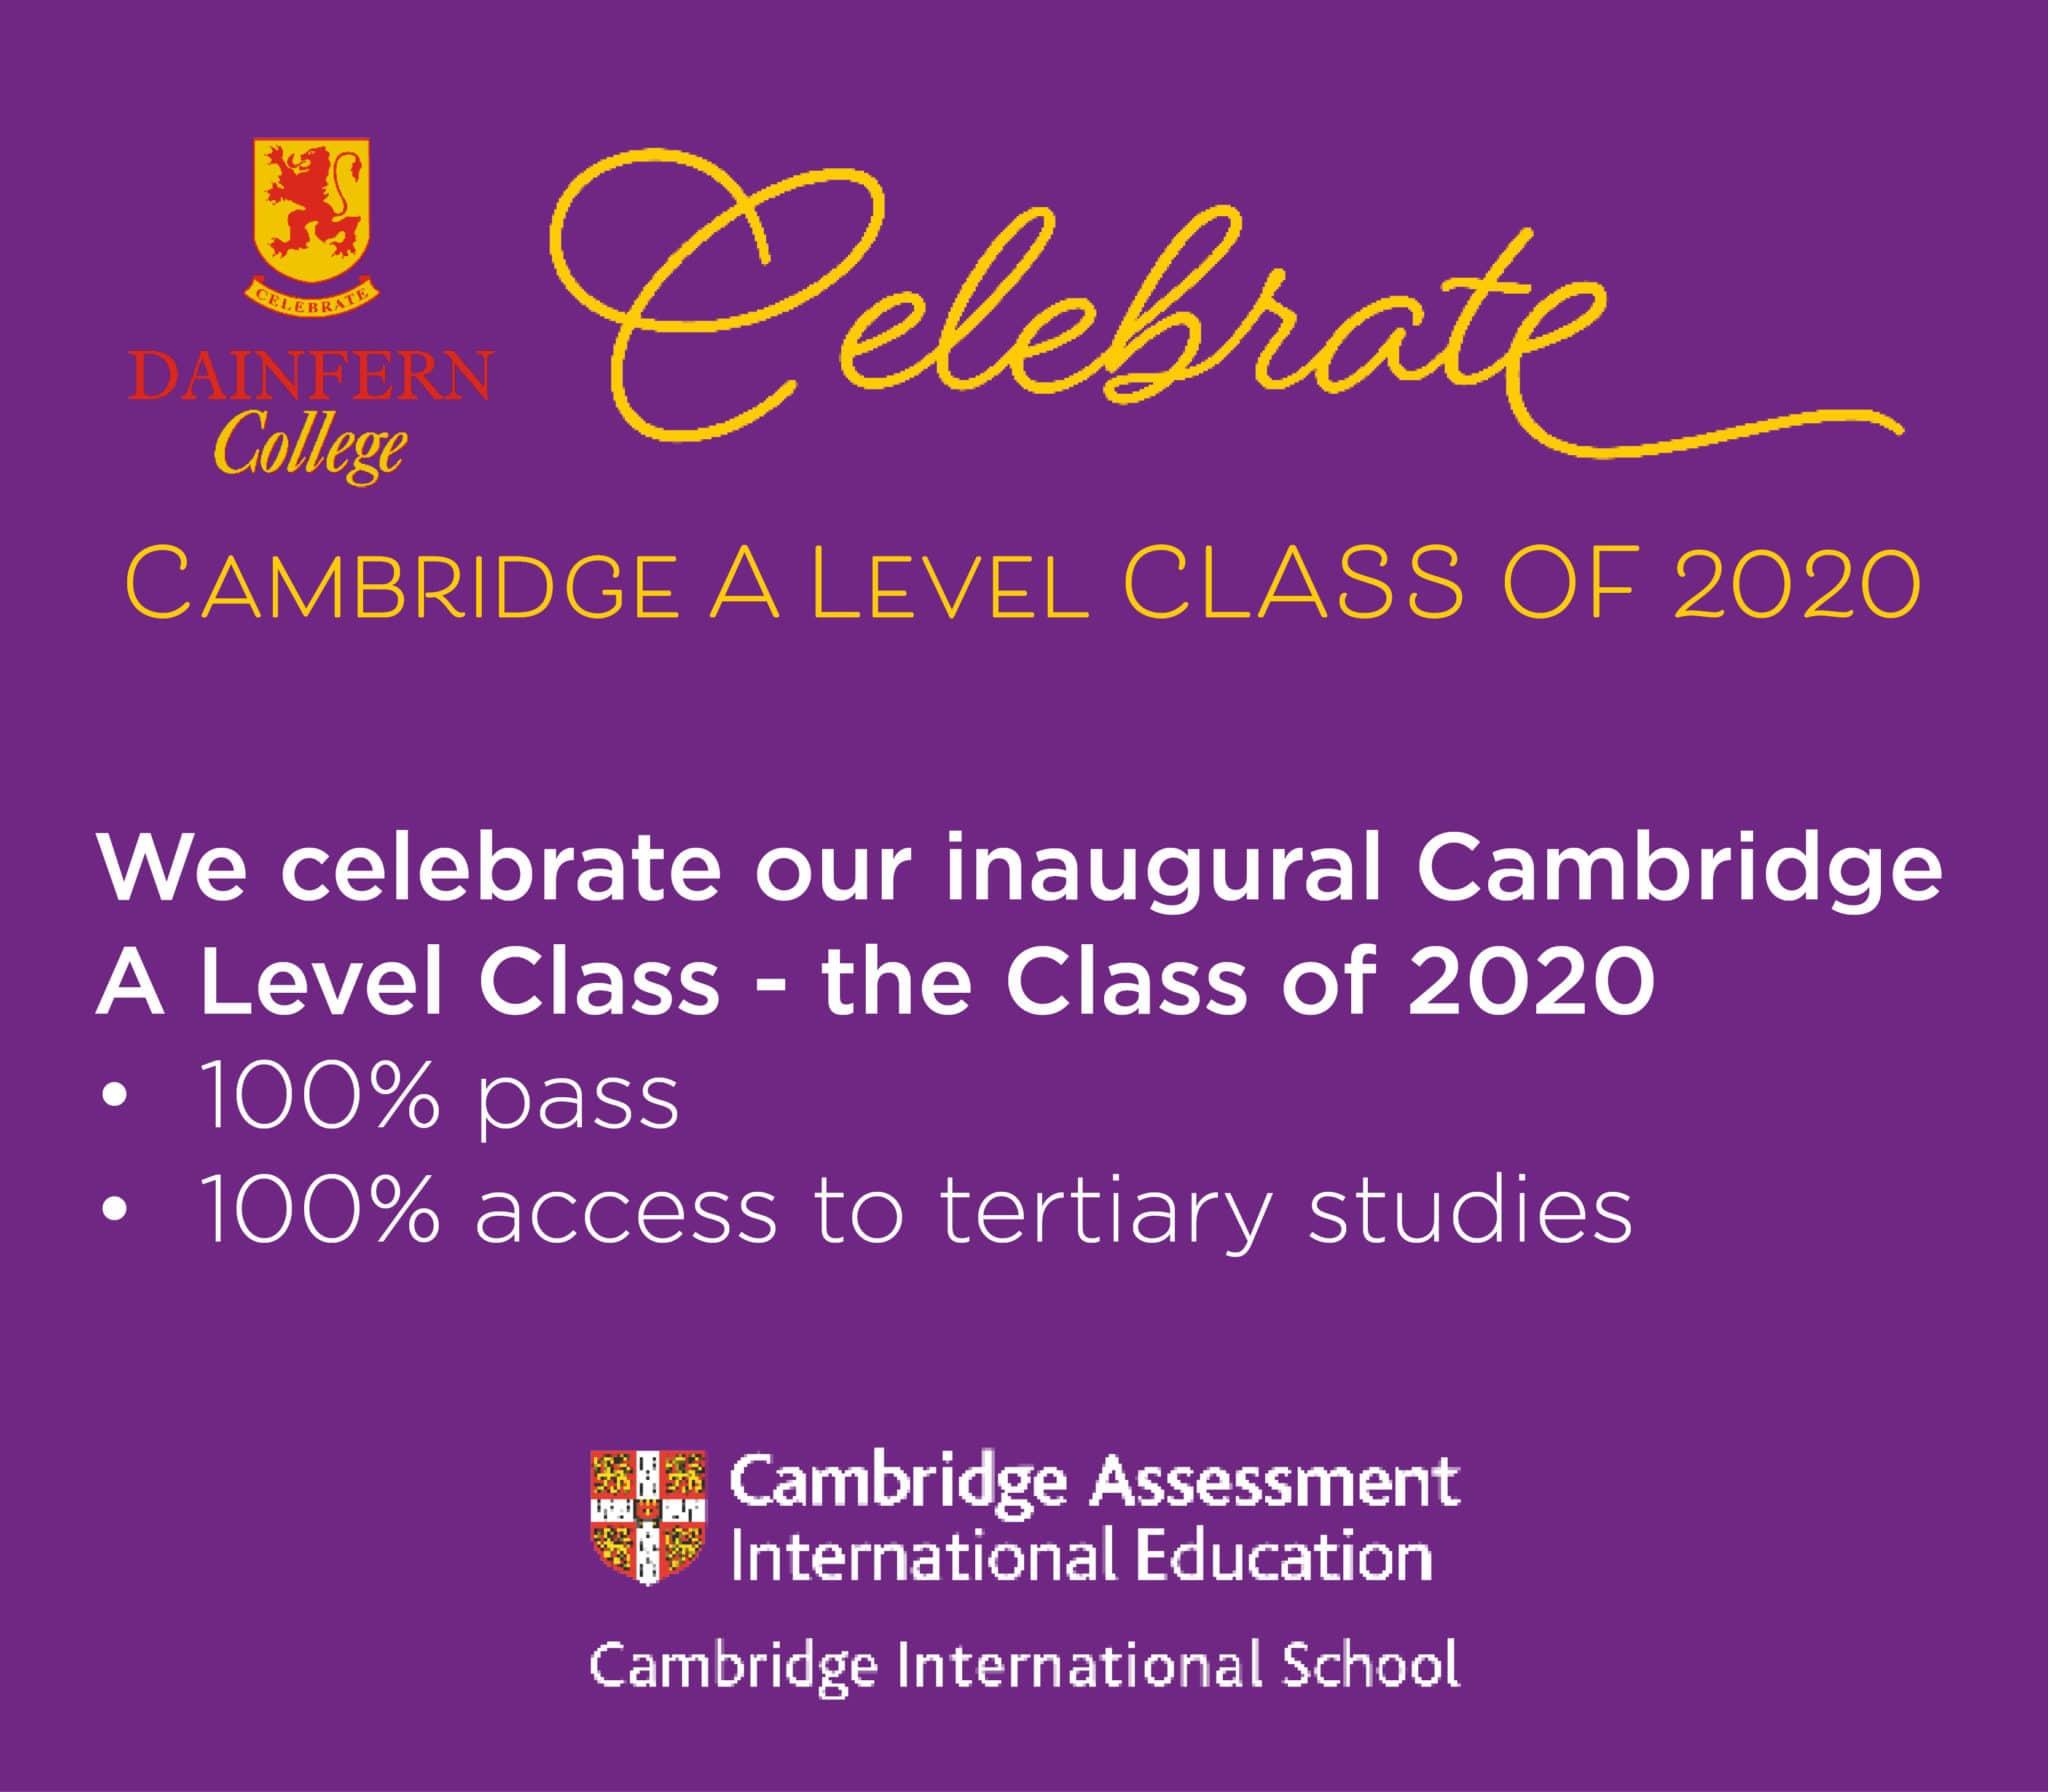 Celebrating the inaugural Cambridge Studies Class of 2020 2